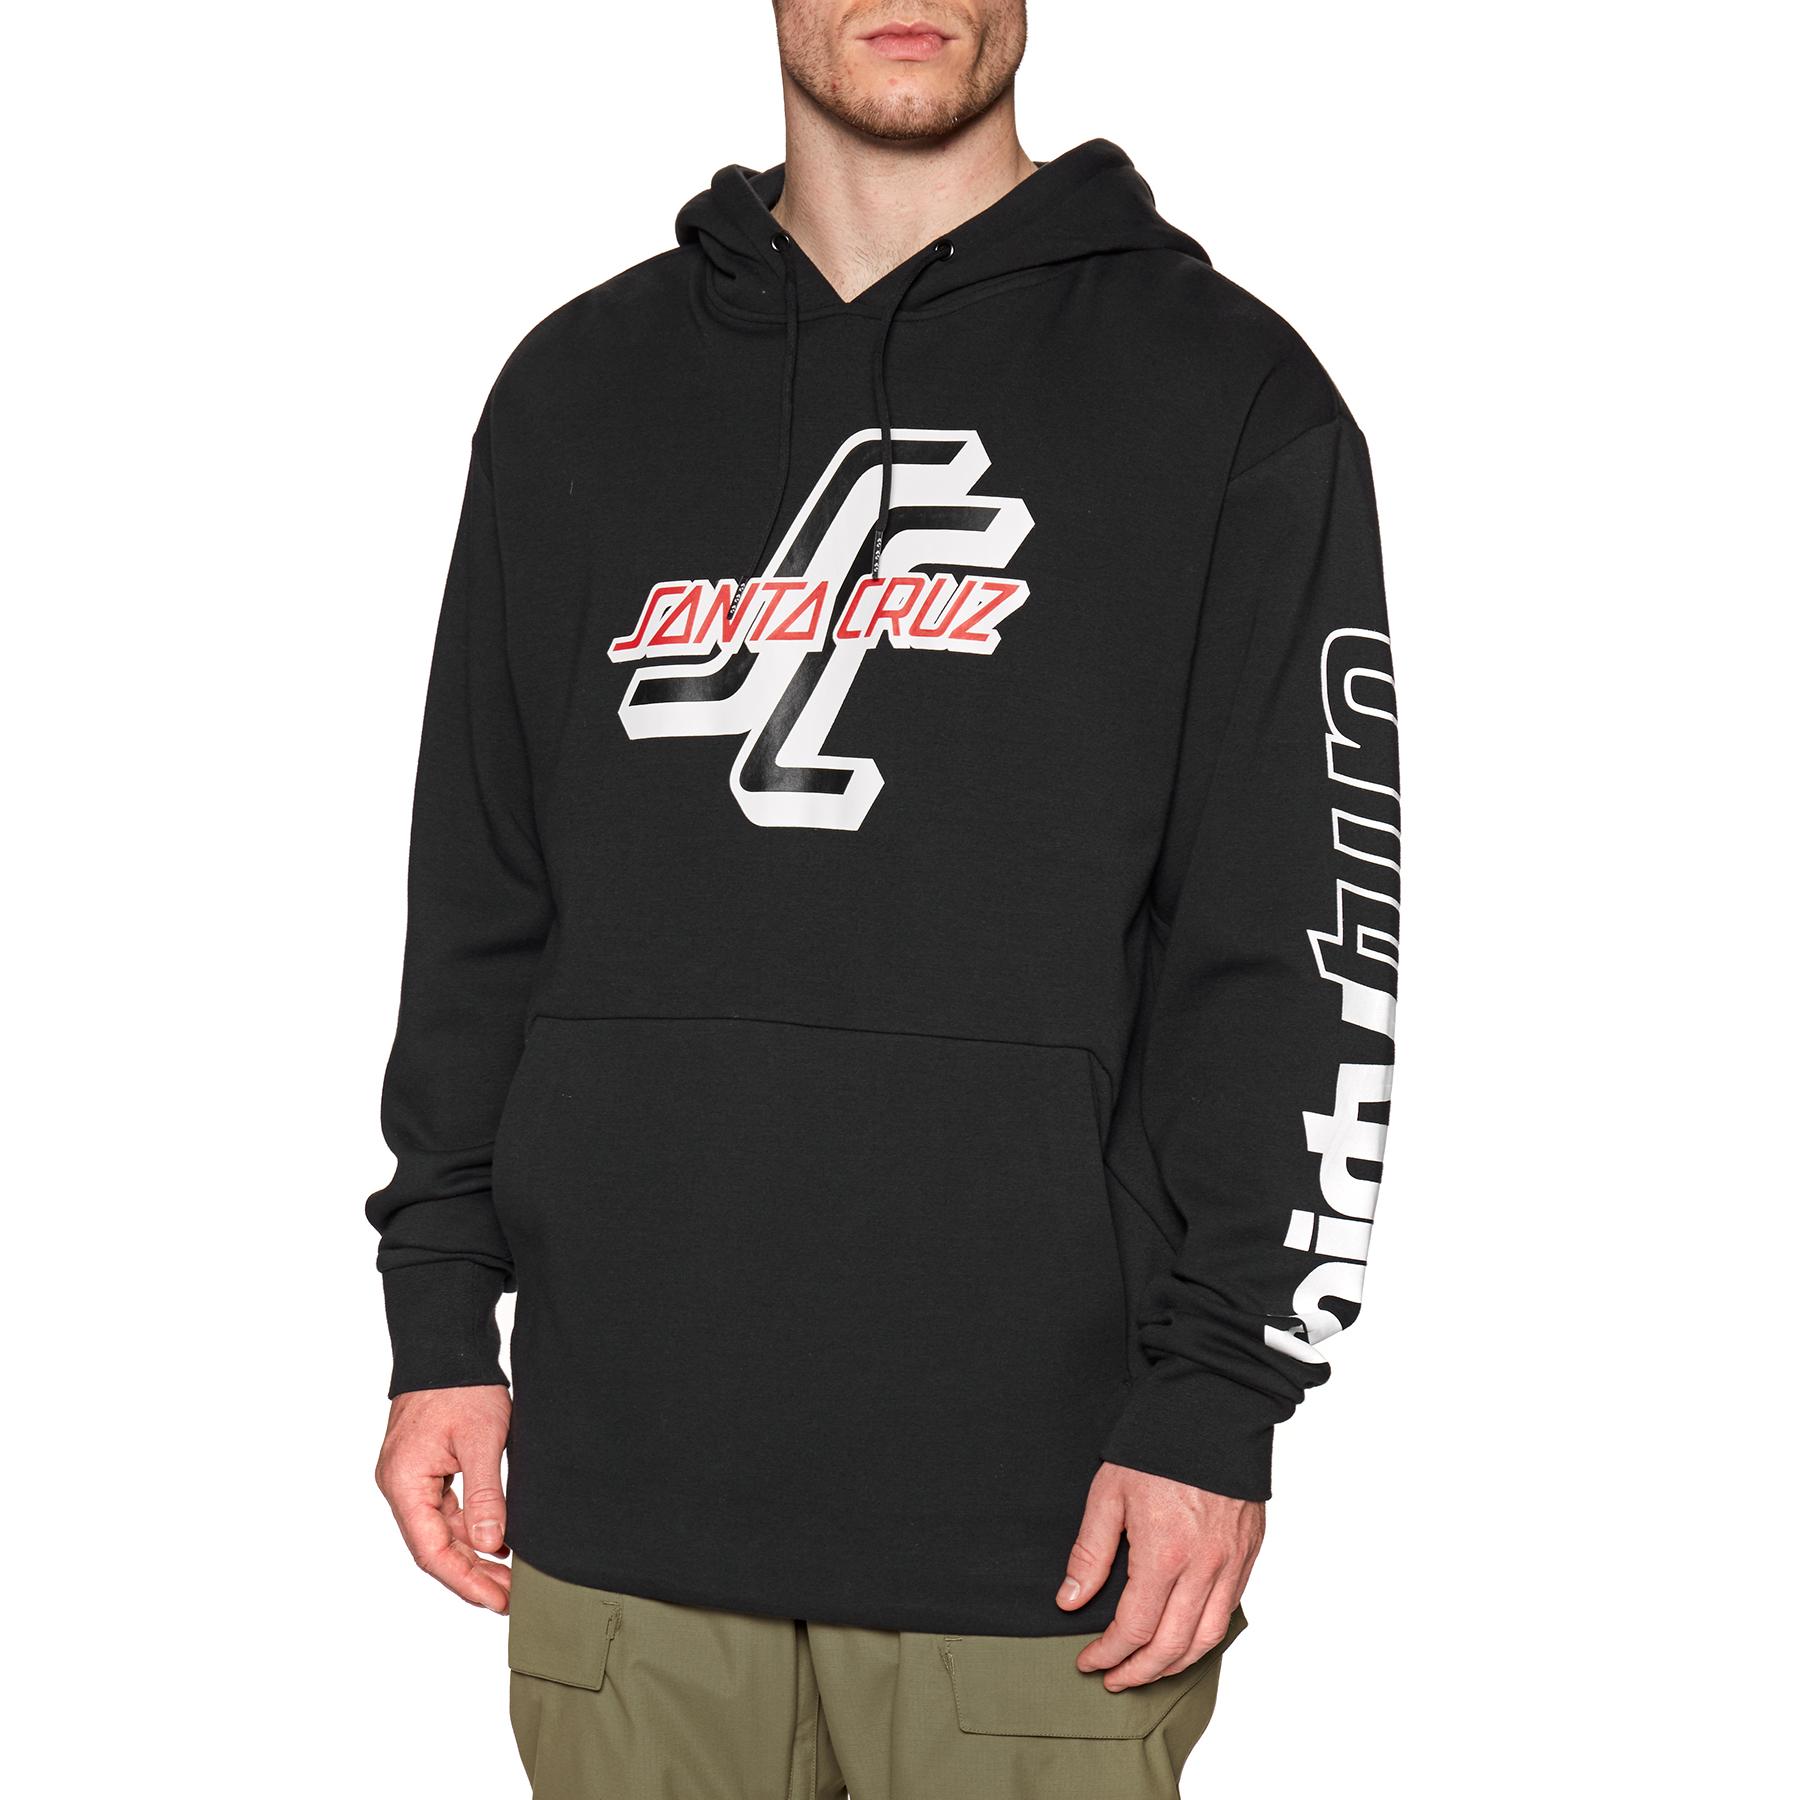 Sweat shirt à capuche adidas Team Issue Fleece marron